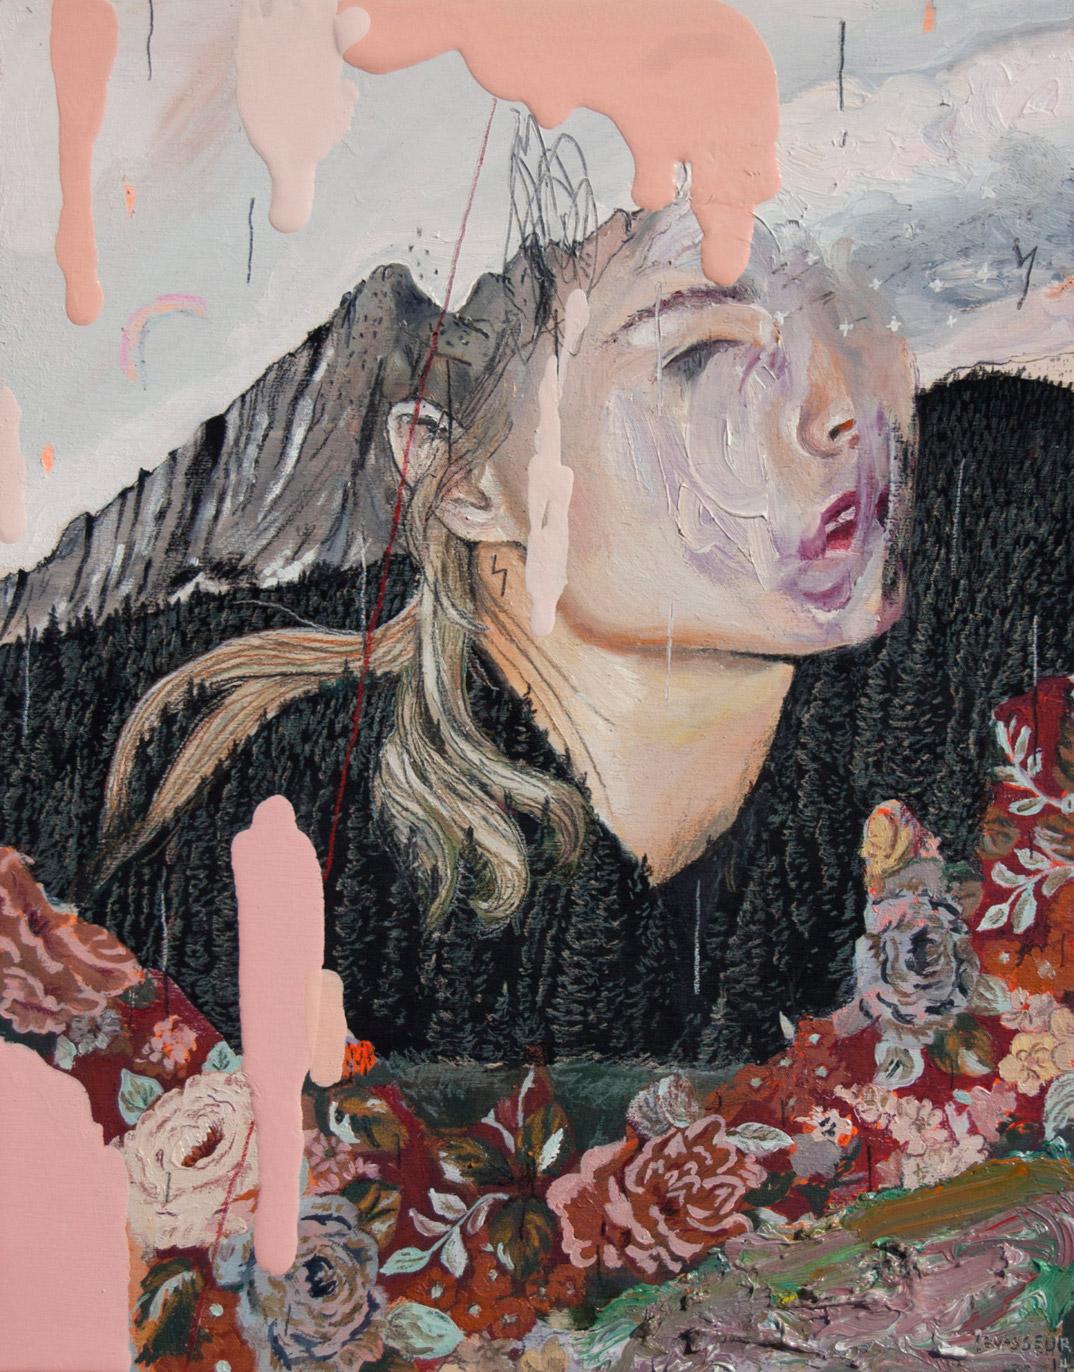 dipinyi-surreali-donne-alexandra-levasseur-07